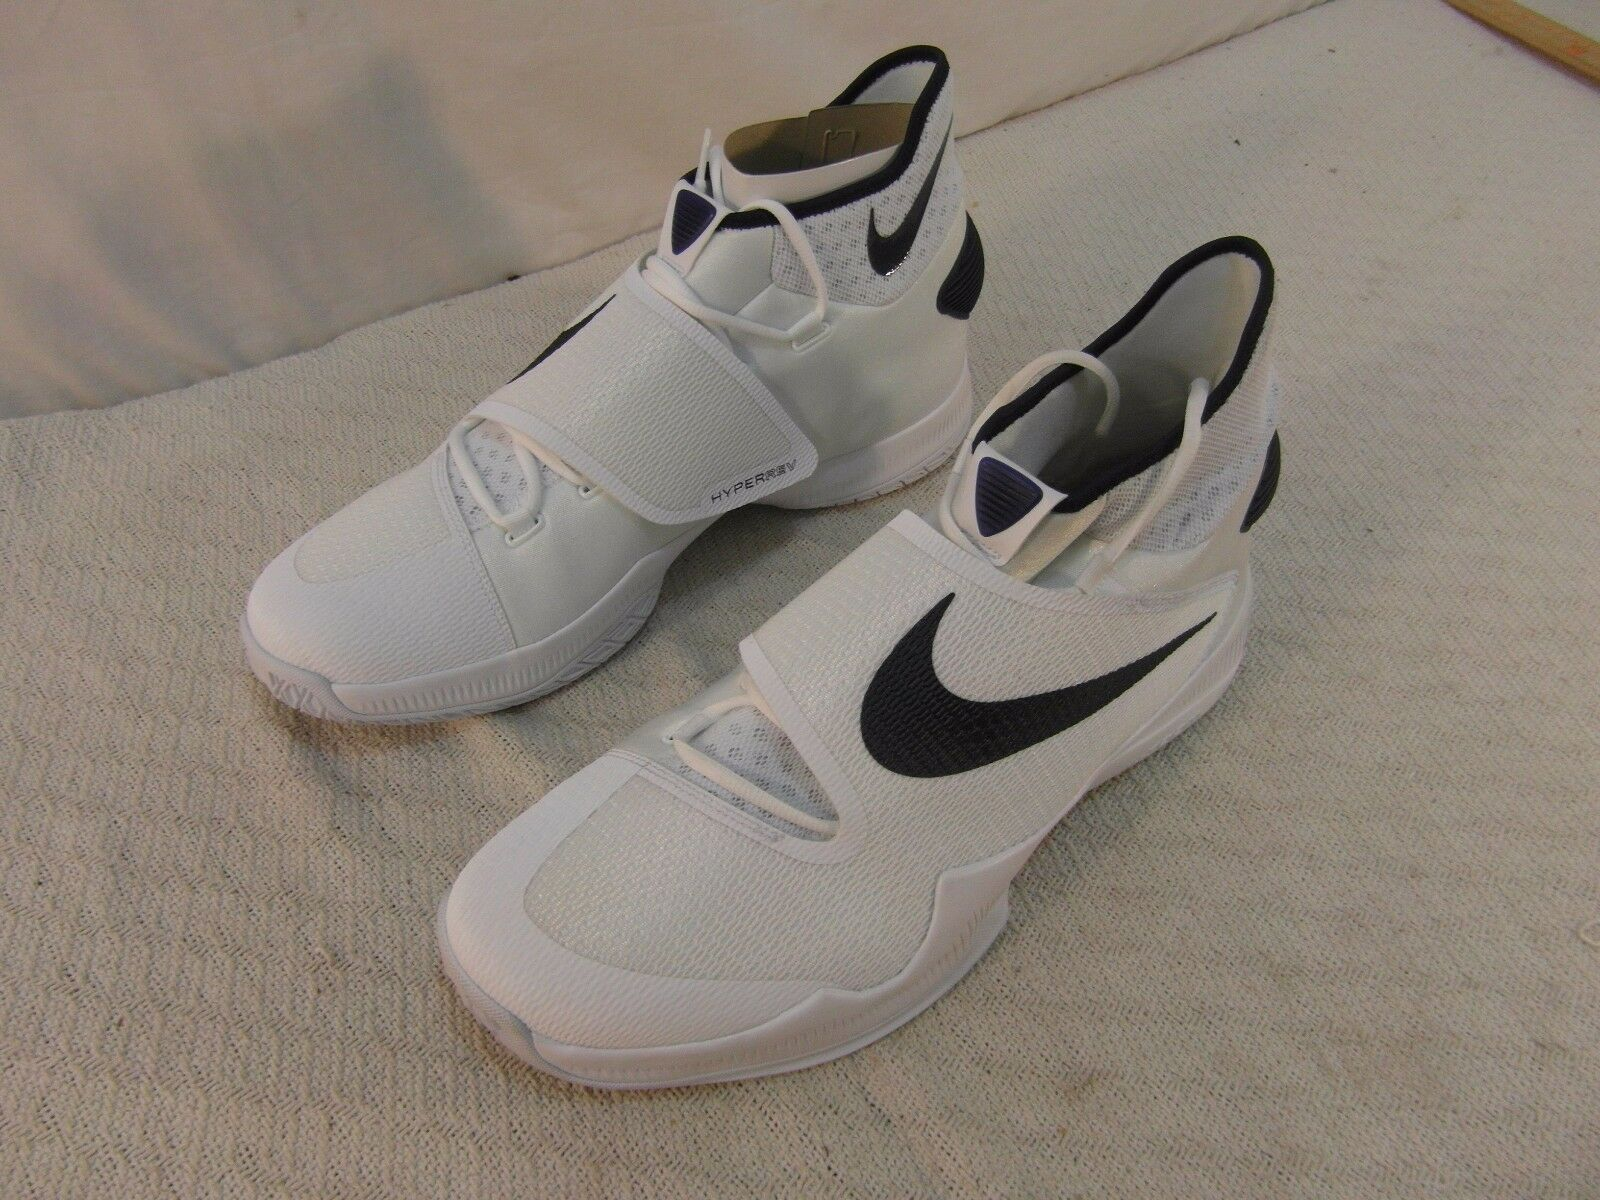 chaussures euros chaussures nike classic cortez nylon femmes formateurs 38 euros chaussures e29c03